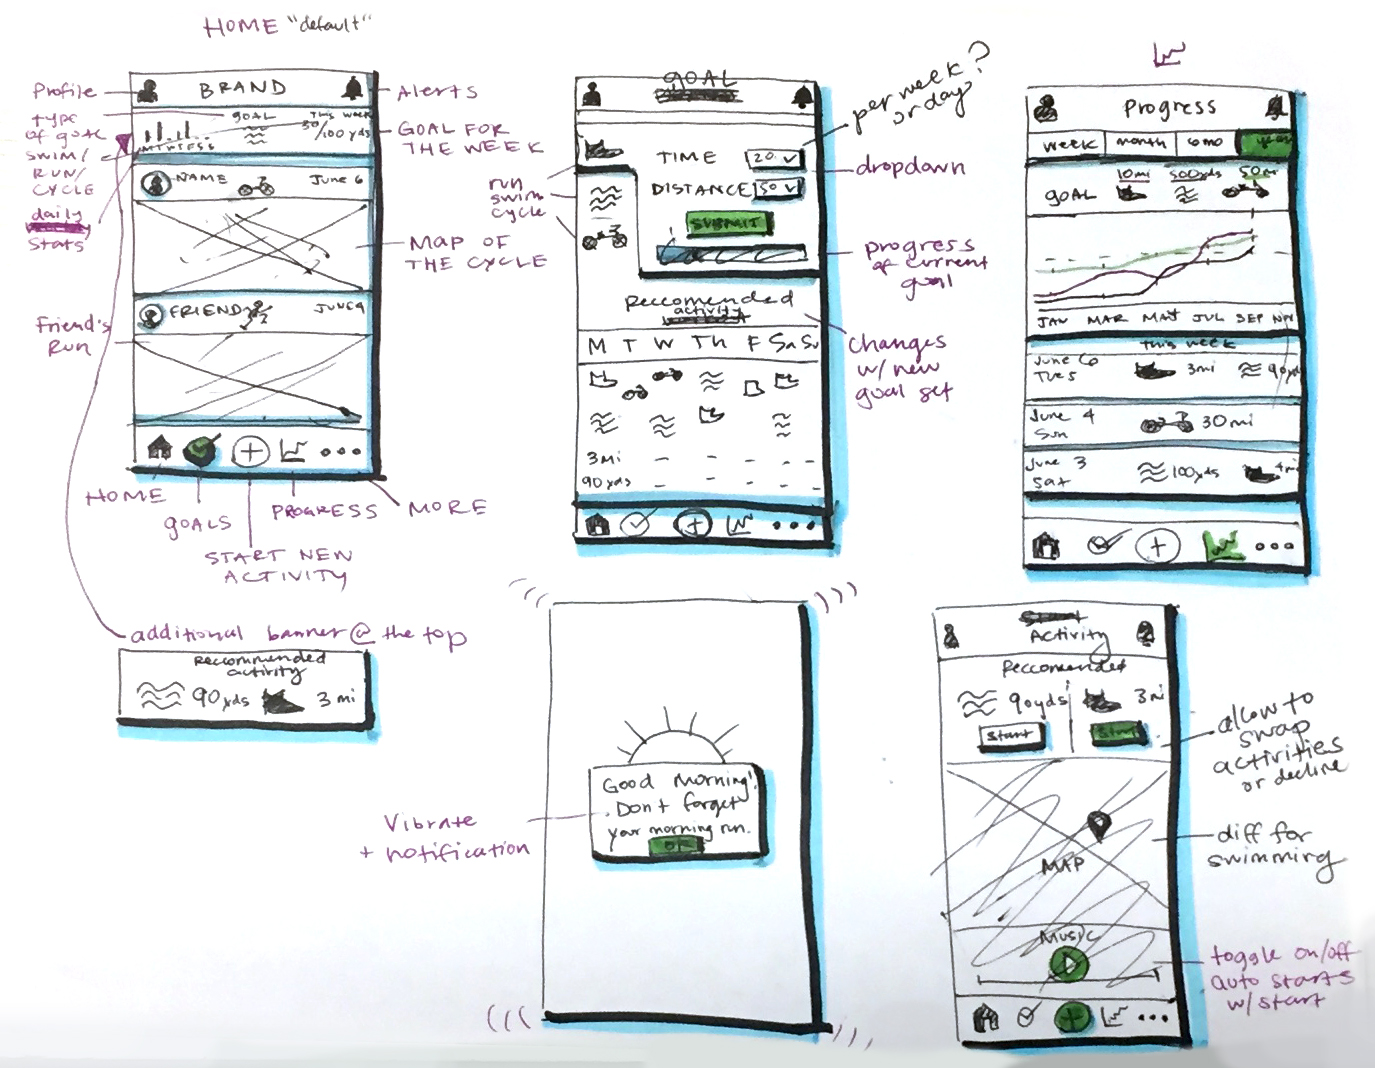 Paper Prototype V1 2.jpg